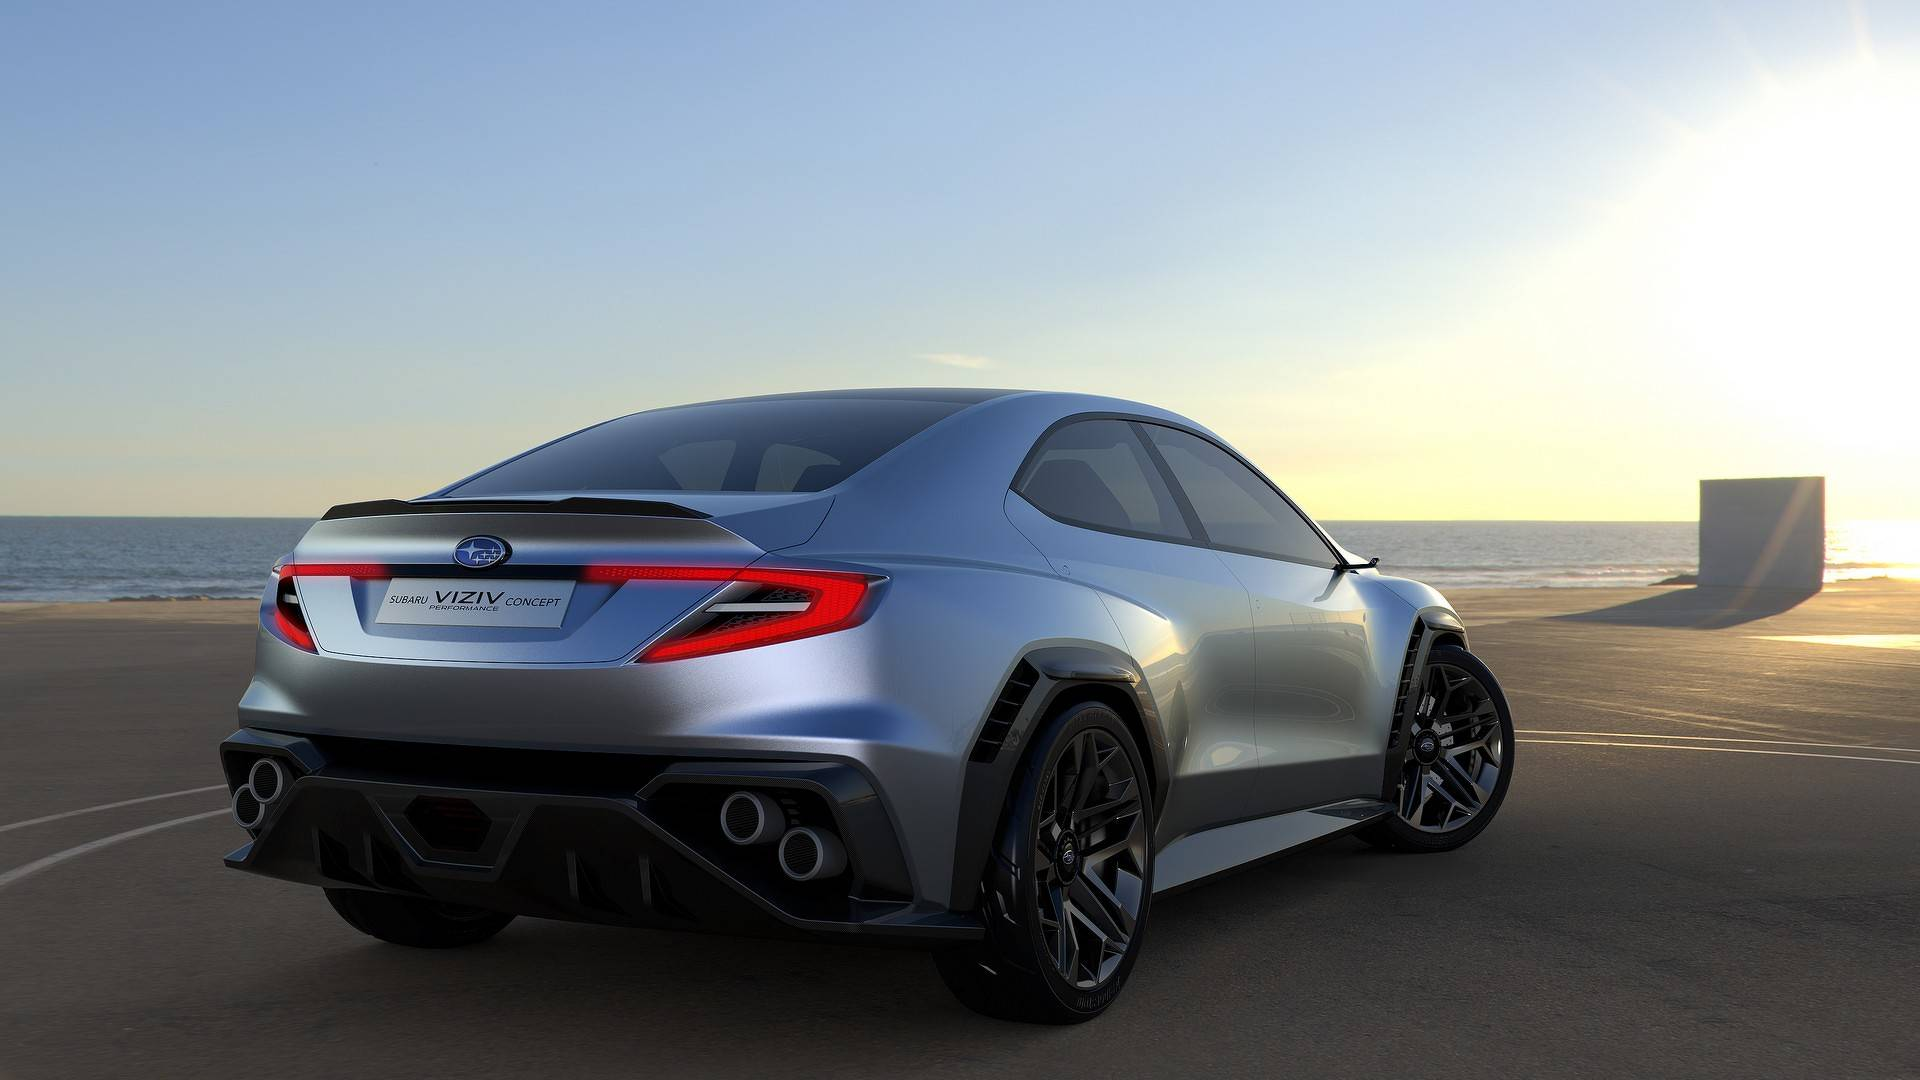 Mm Auto Sales >> Subaru Viziv Performance Concept Is Slightly Larger Than ...